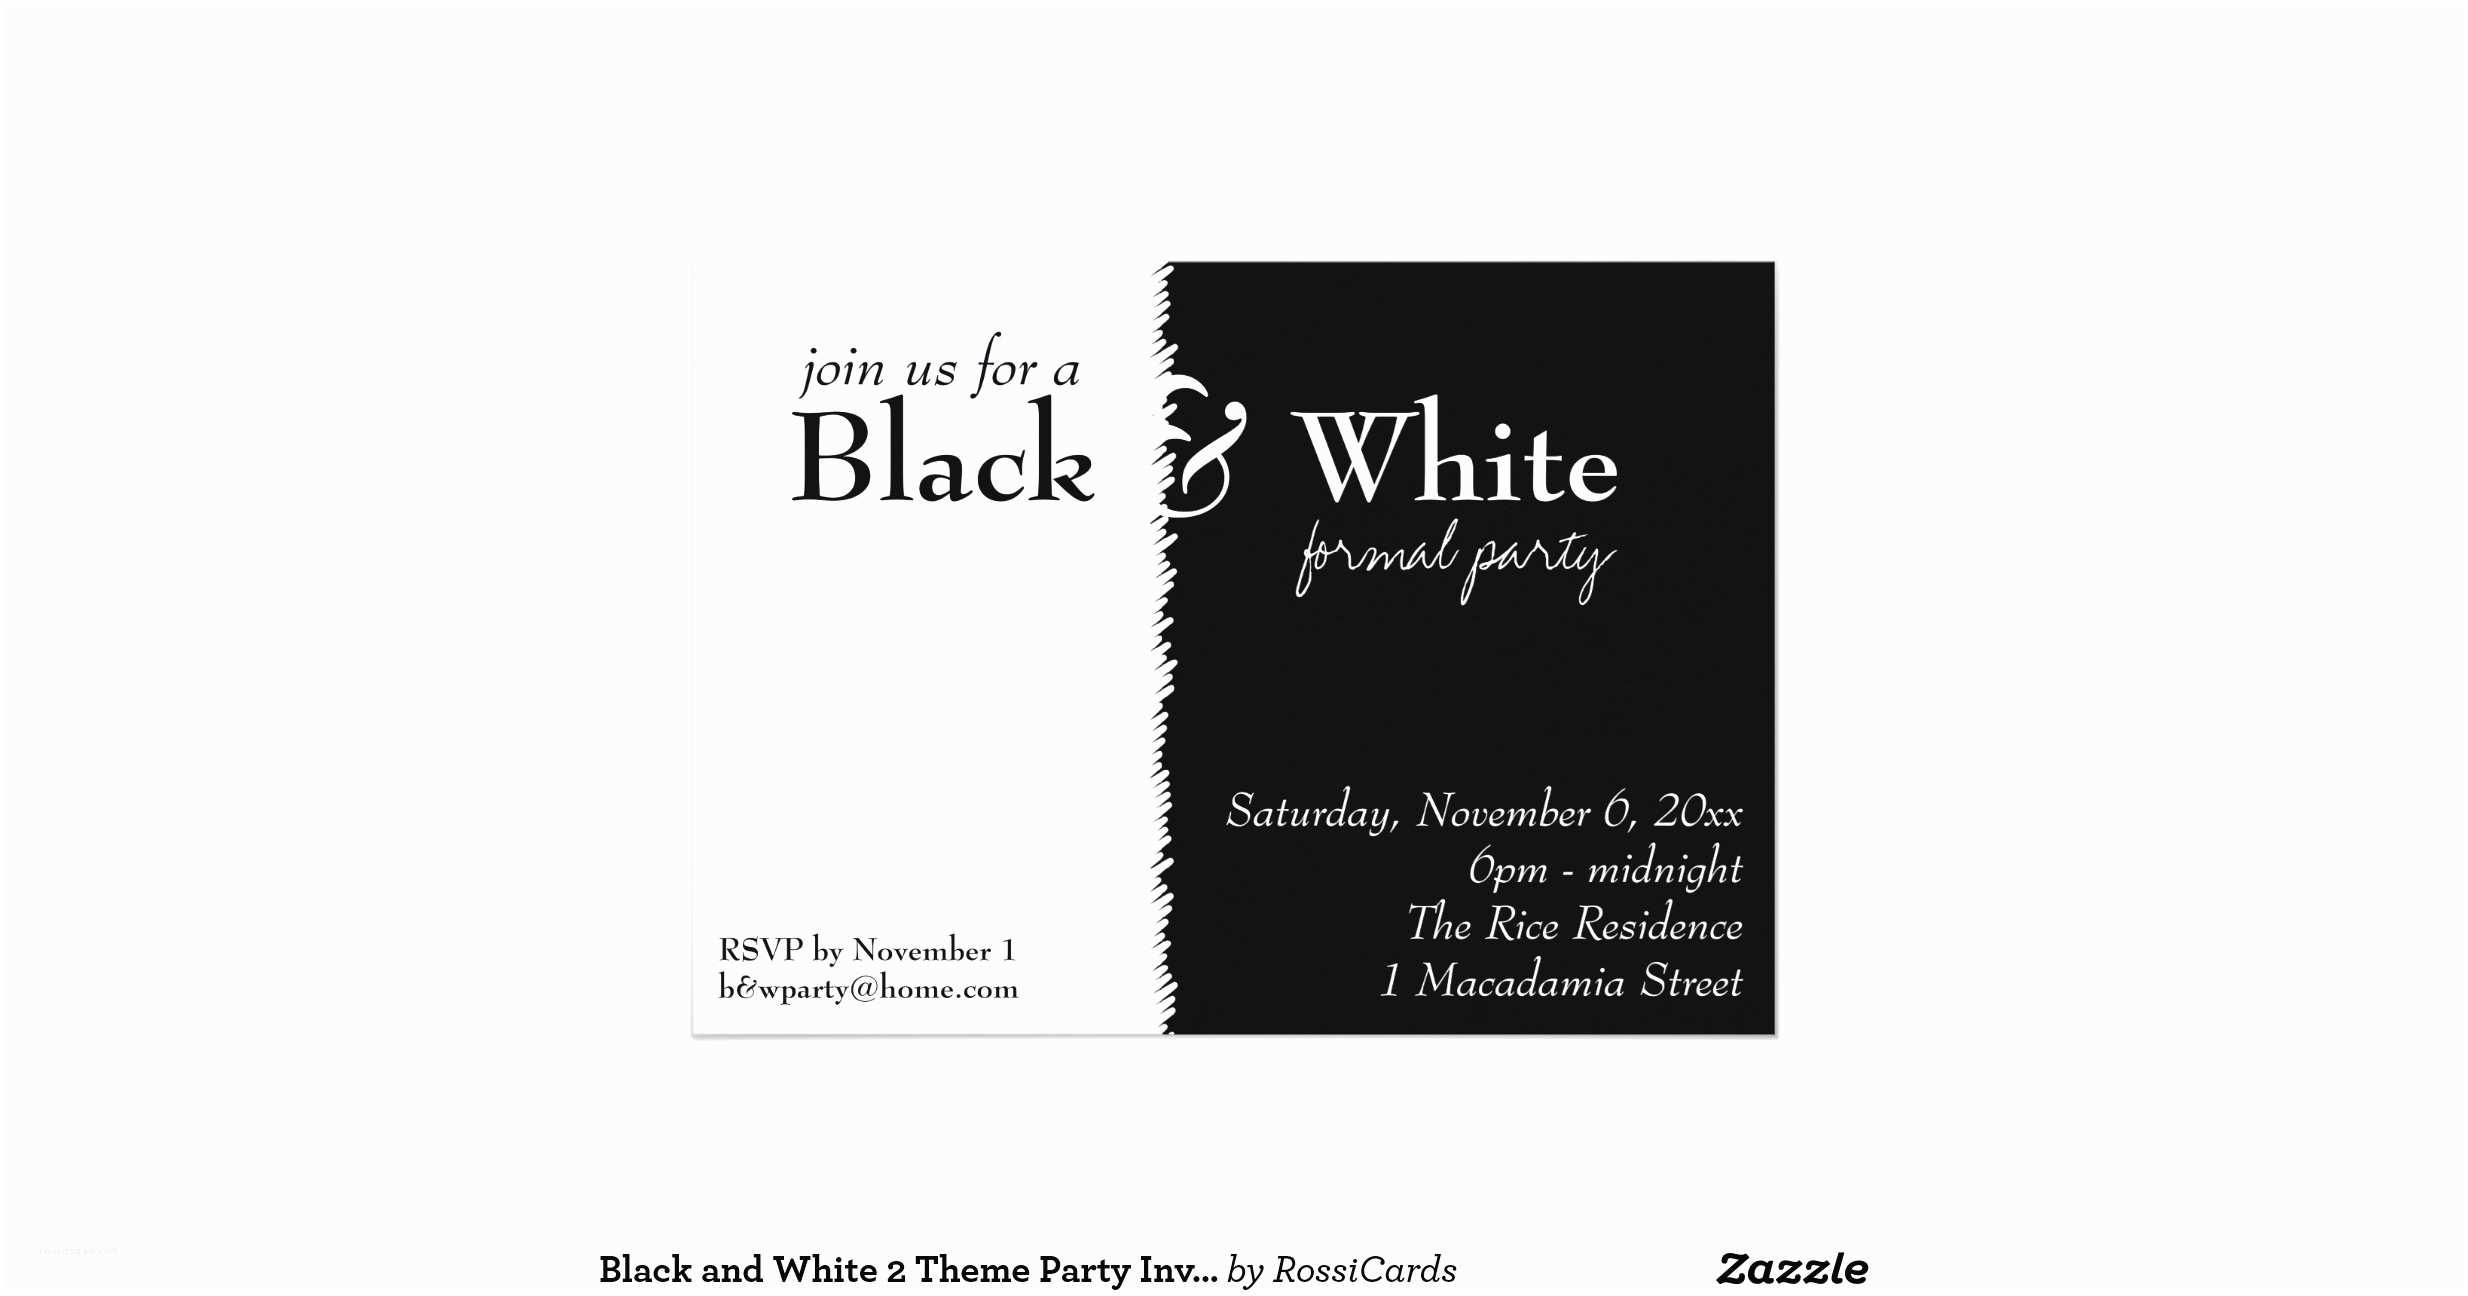 Black and White Birthday Invitations Black and White 2 theme Party Invitation